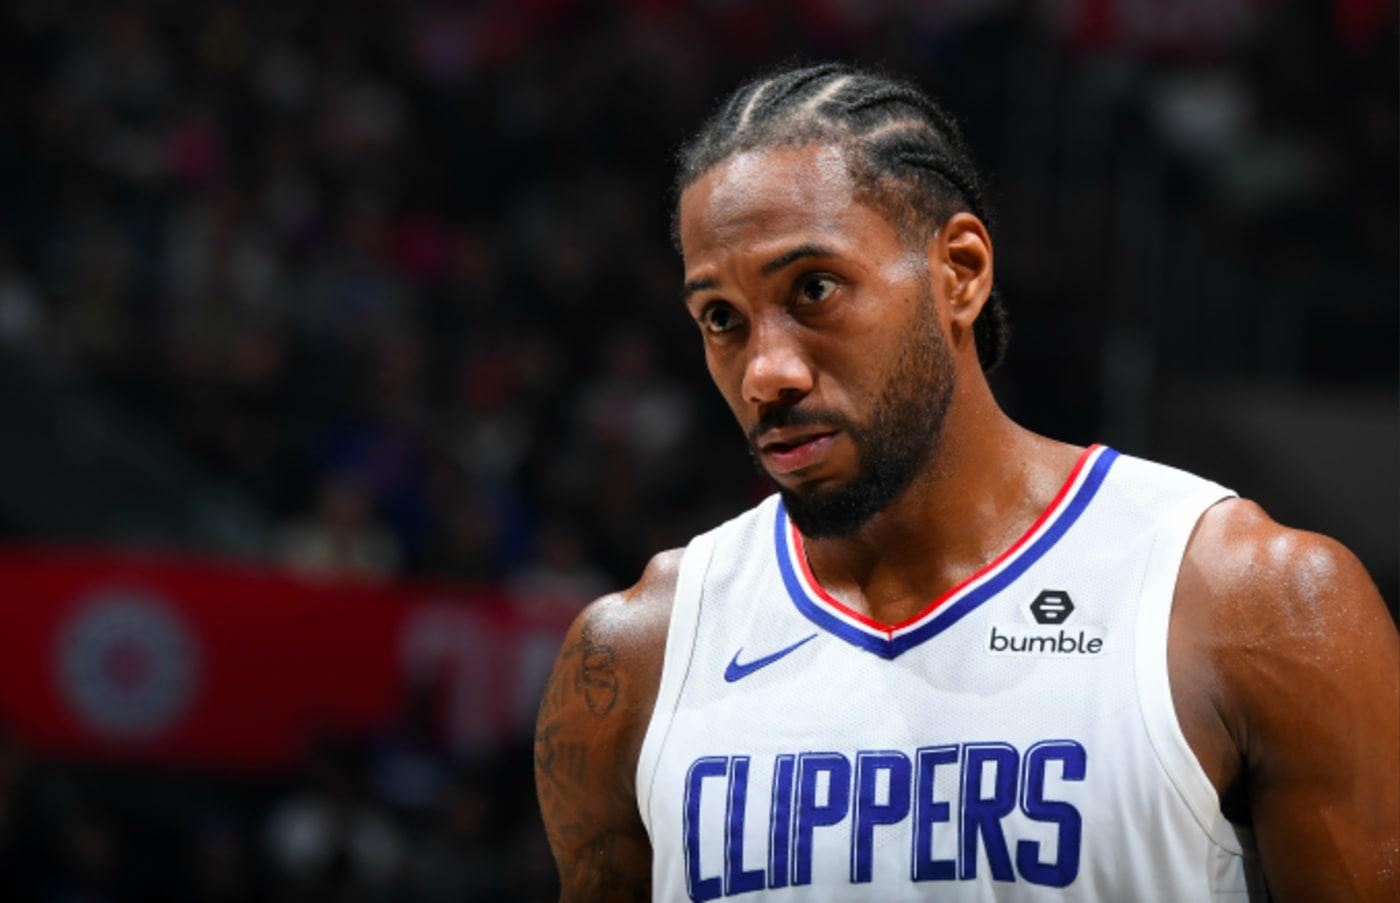 Kawhi Leonard #2 of the LA Clippers